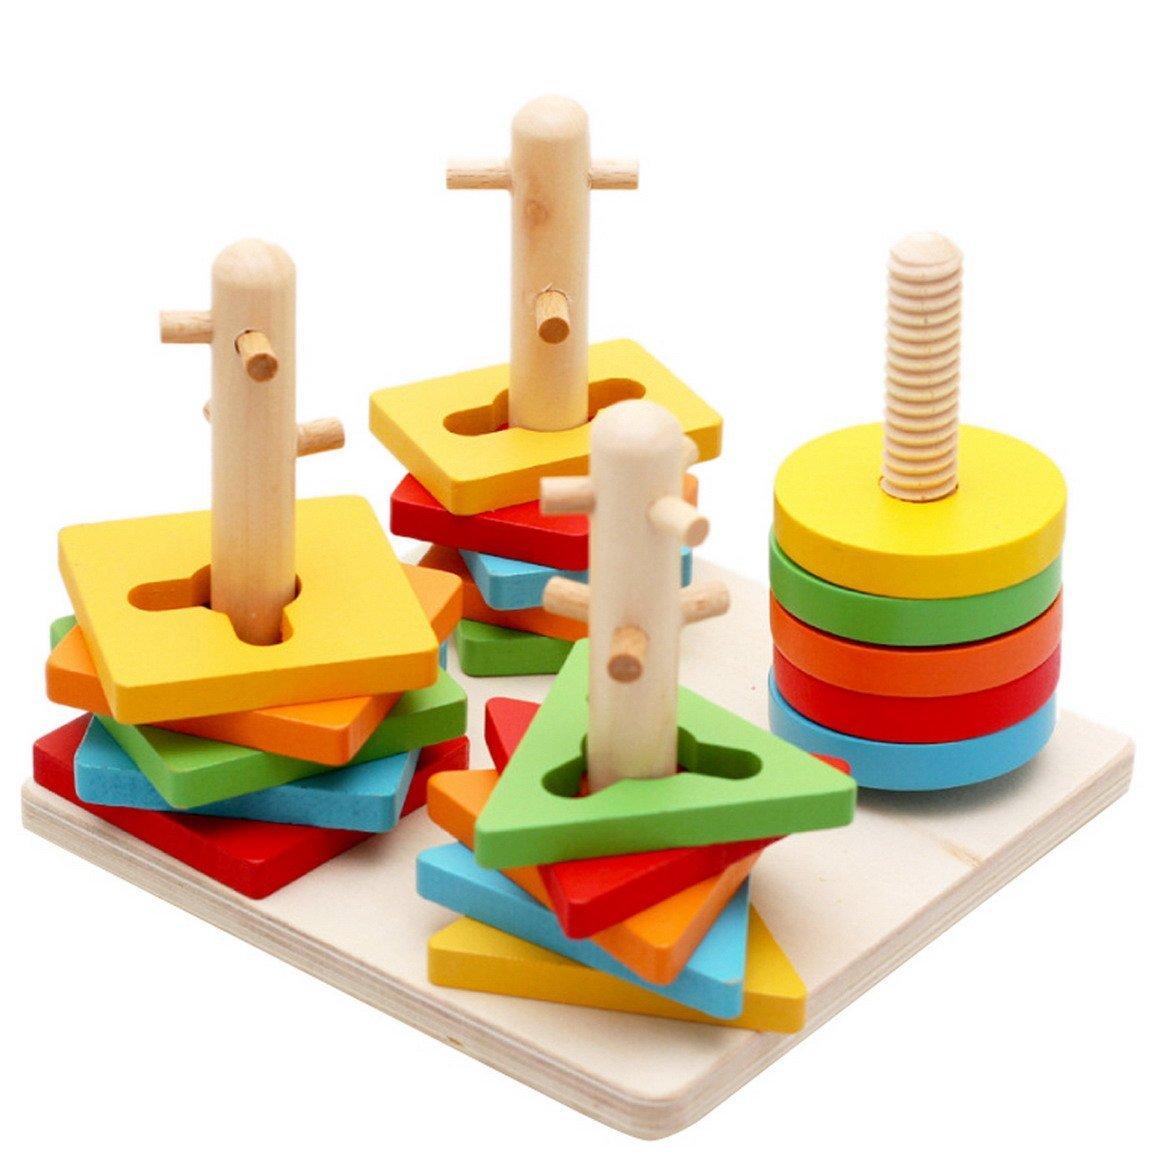 Aivtalk Children Kids Baby Wooden Stacking Column Shapes Building Blocks Educational Toy